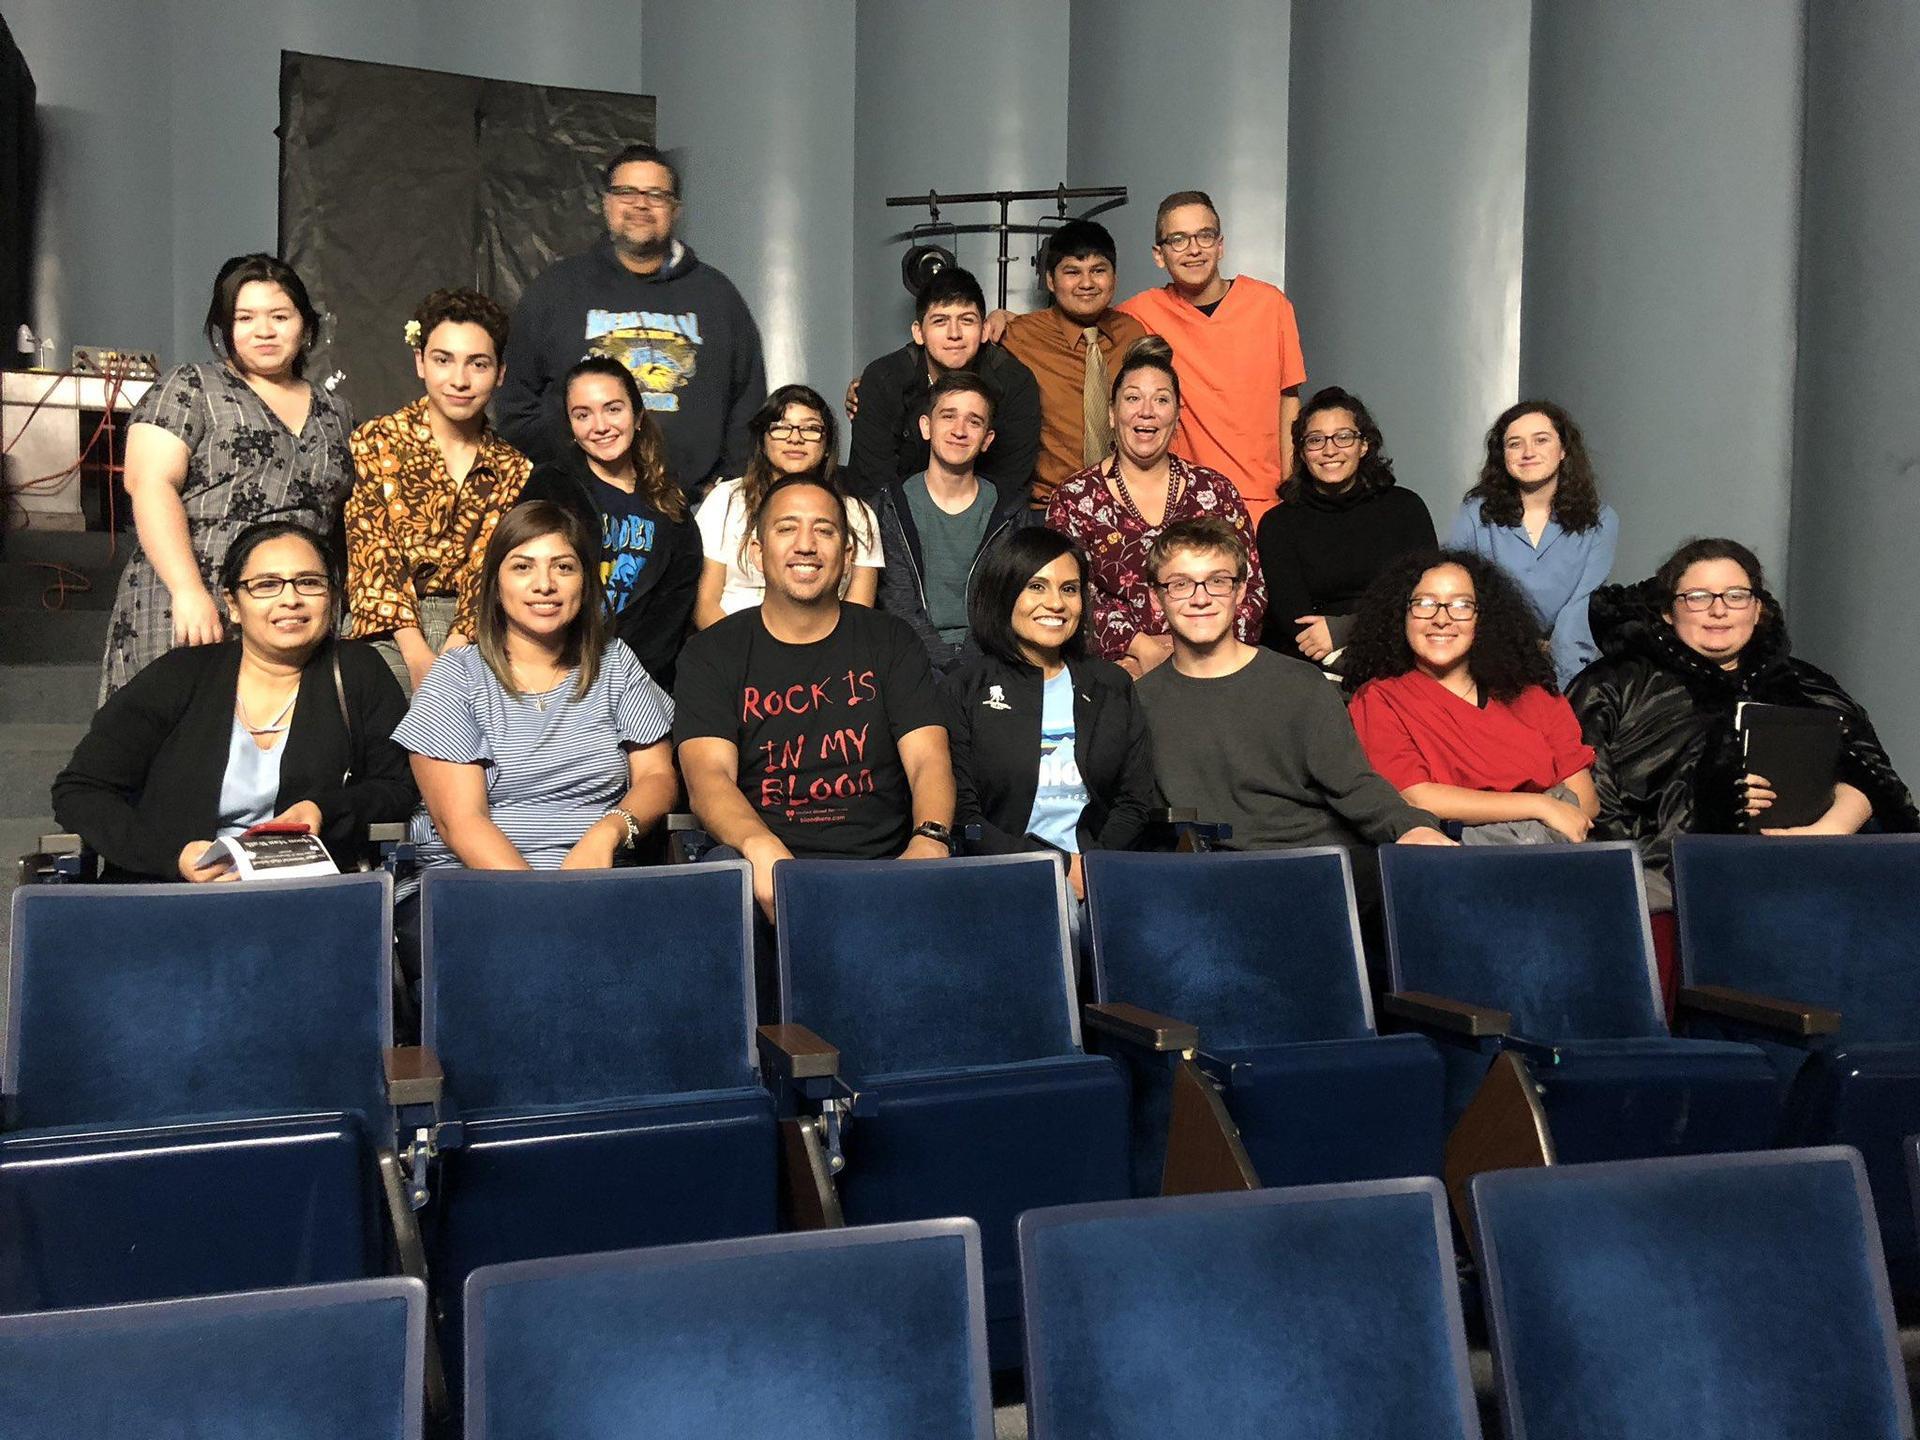 staff group picture in auditorium